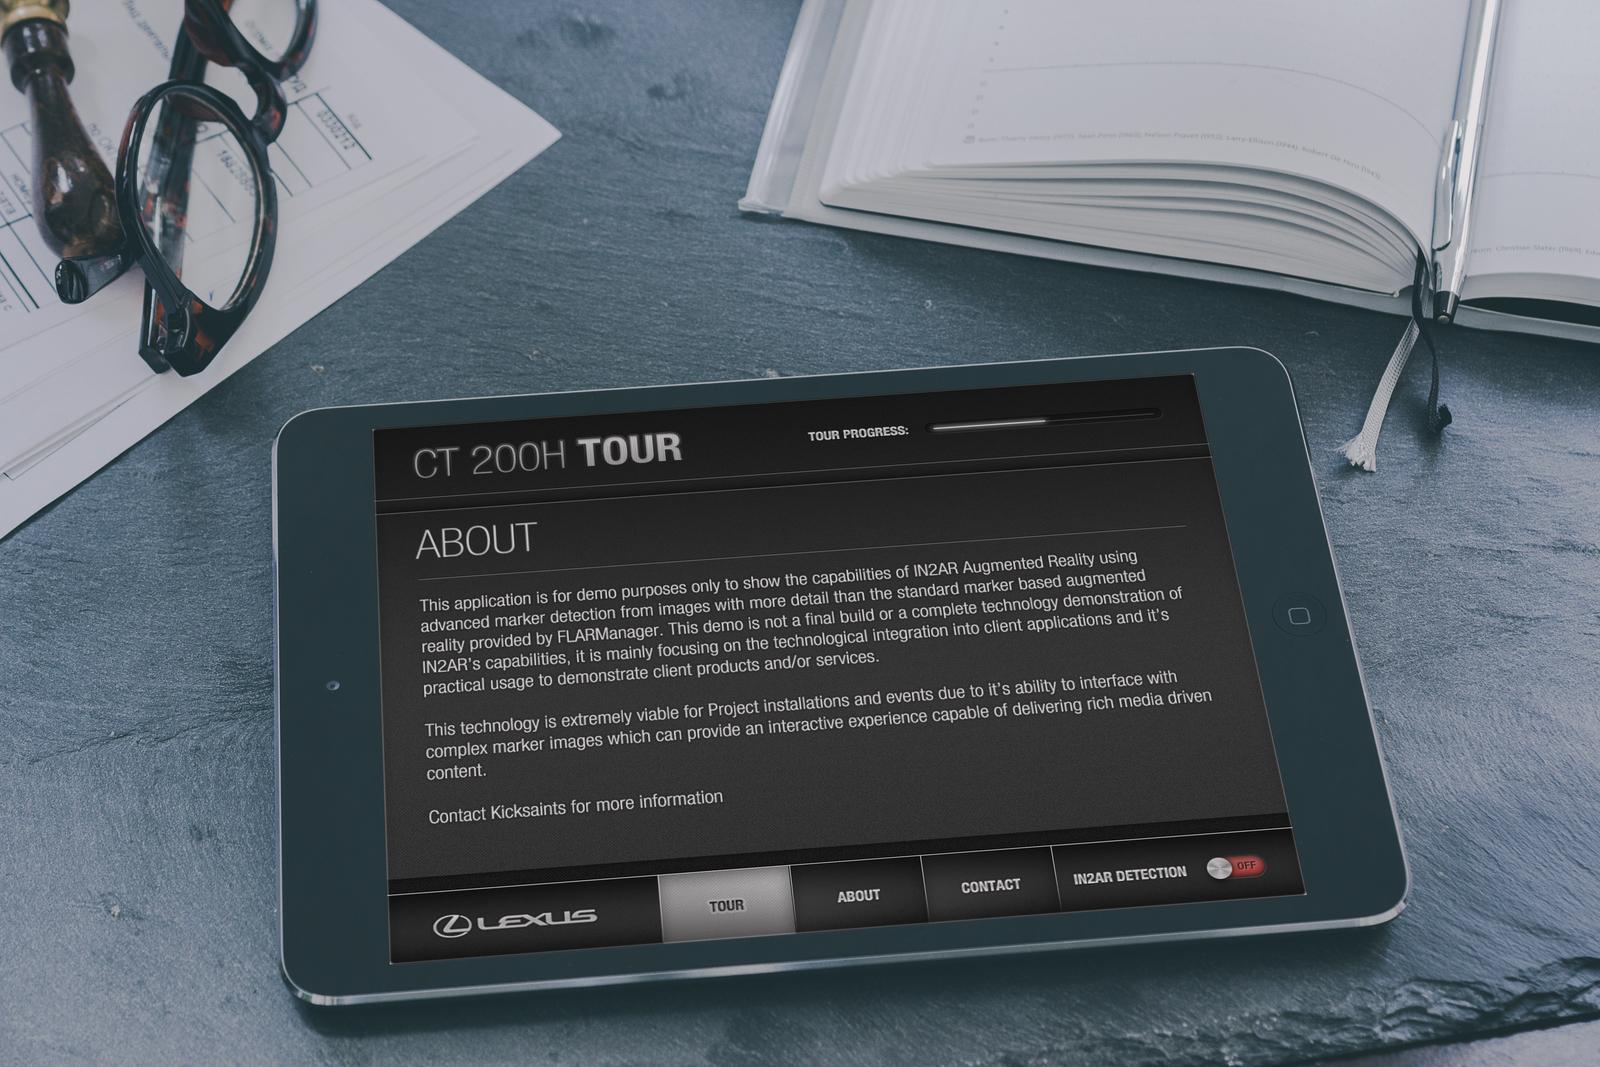 Lexus mobile sales assistant and marketing app